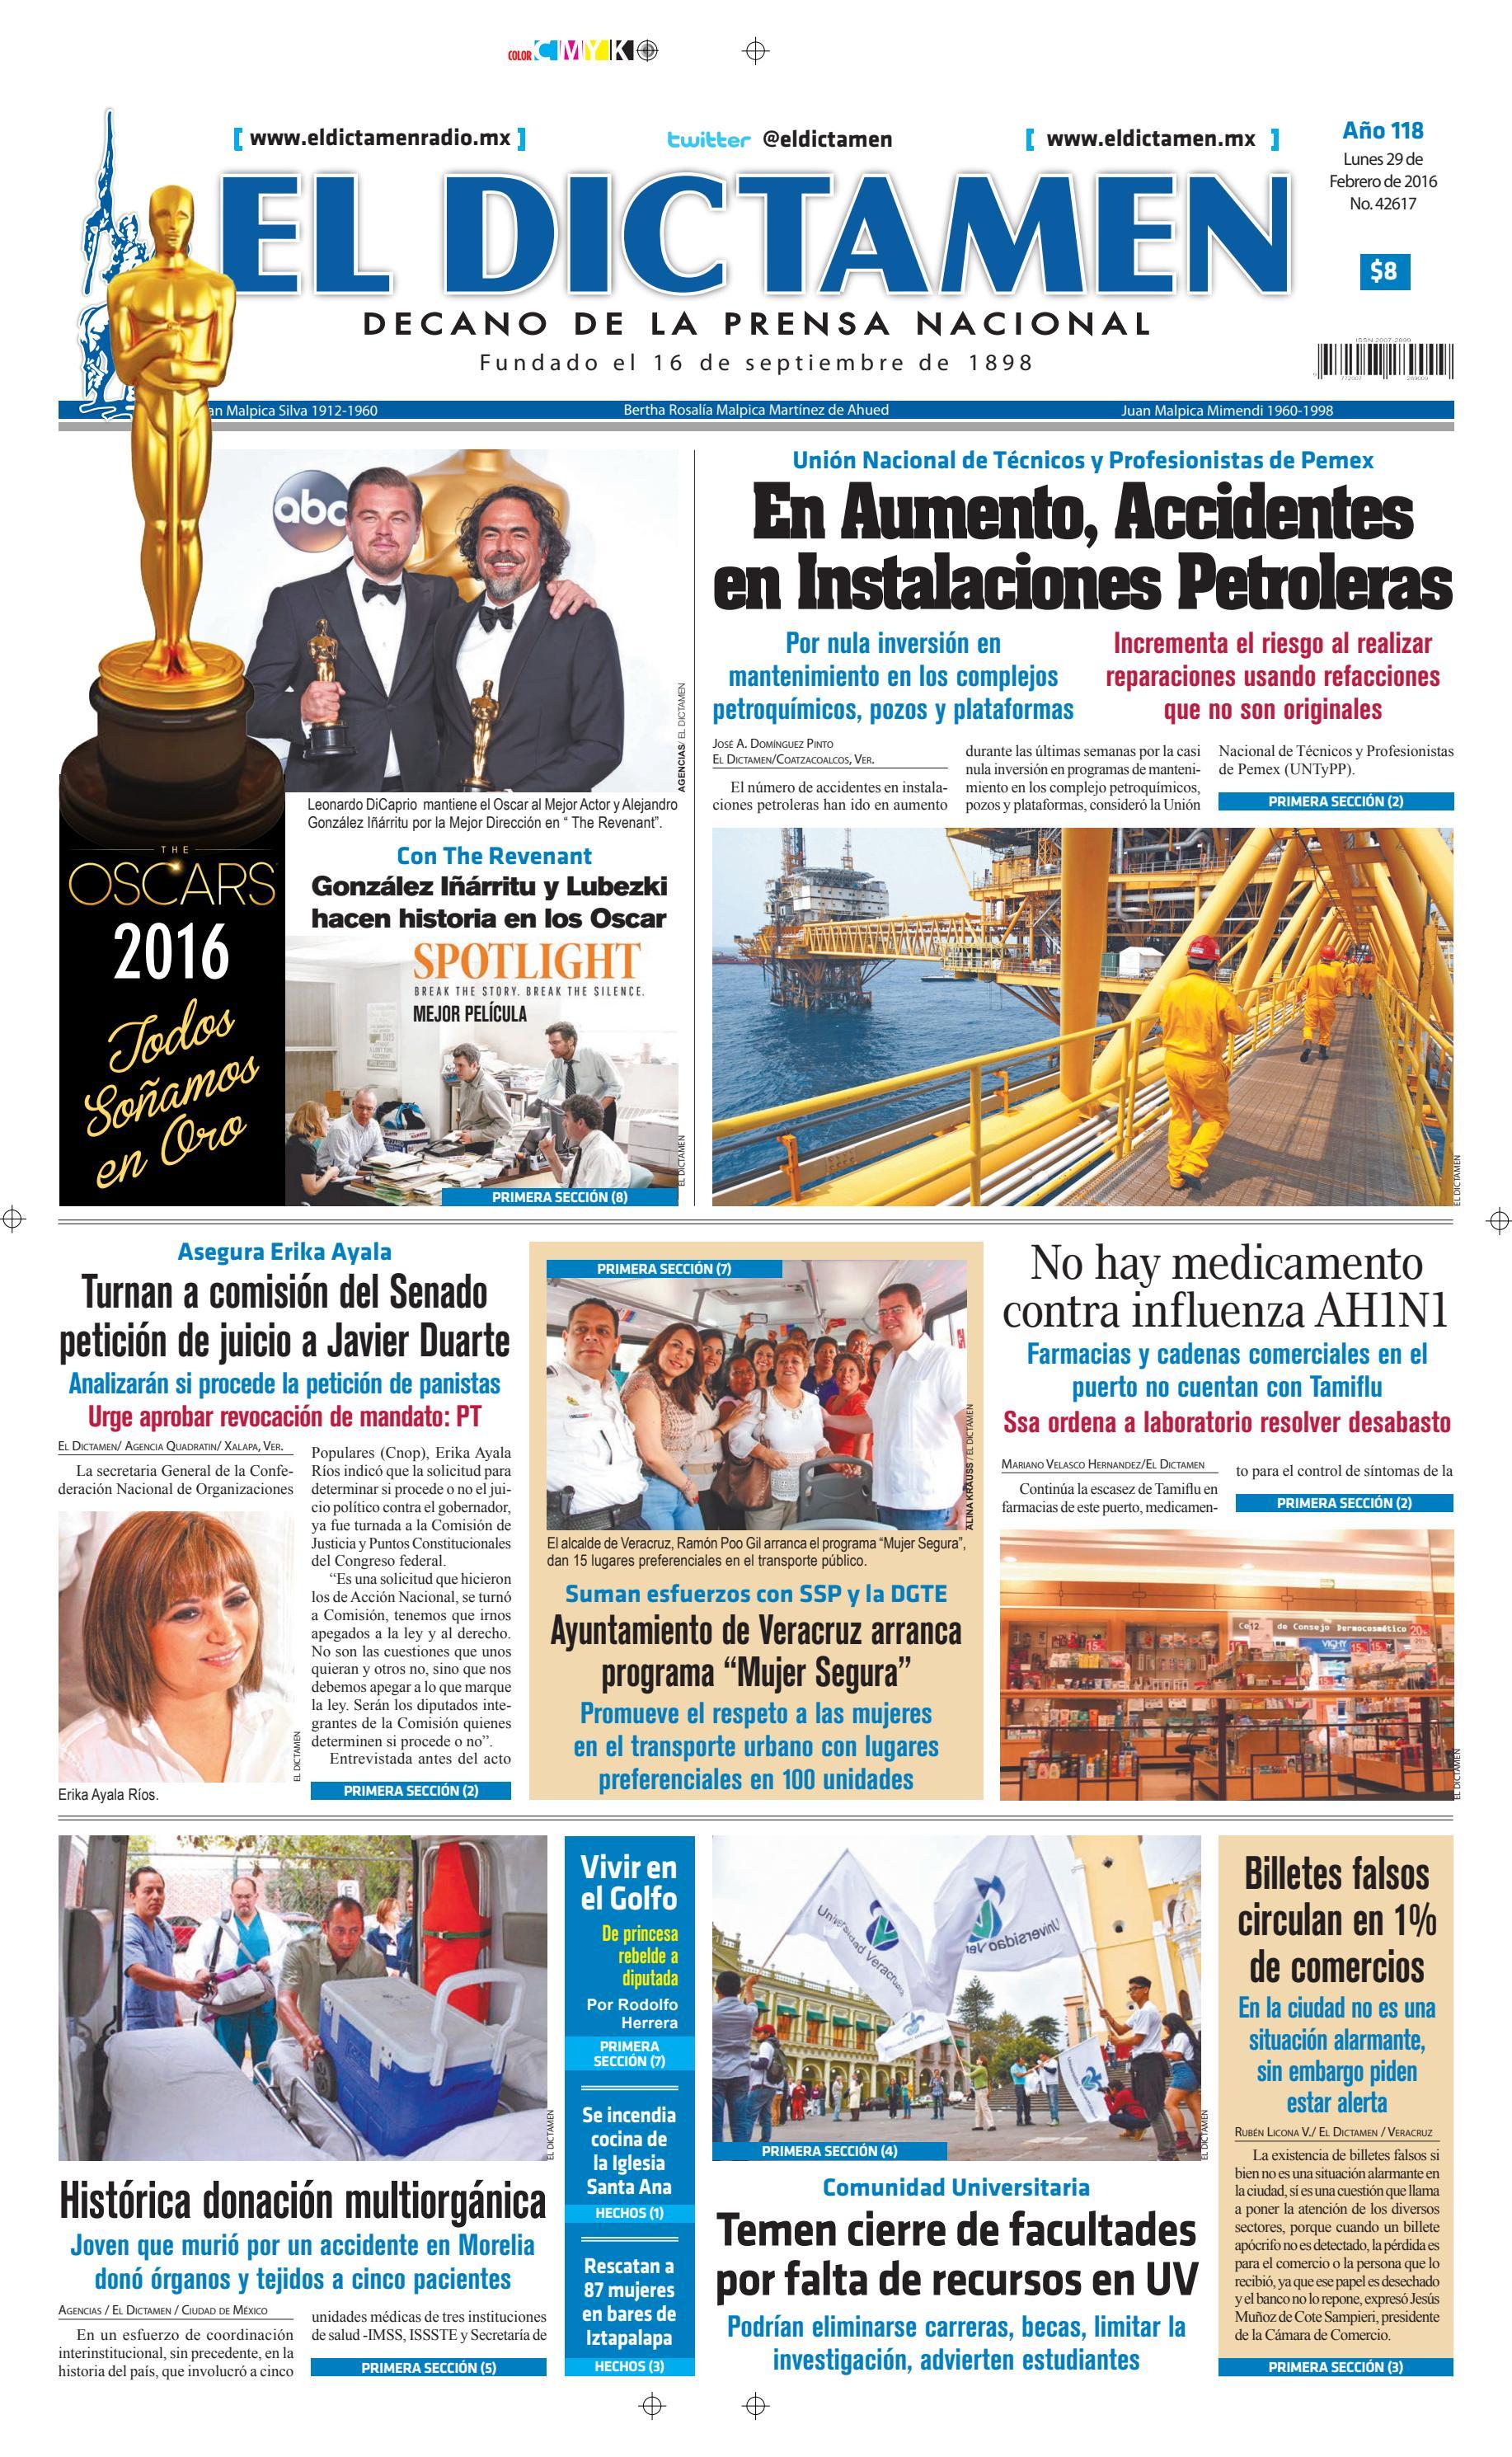 El Dictamen 29 de enero de 2016 by El Dictamen - issuu d7b2315f24c49